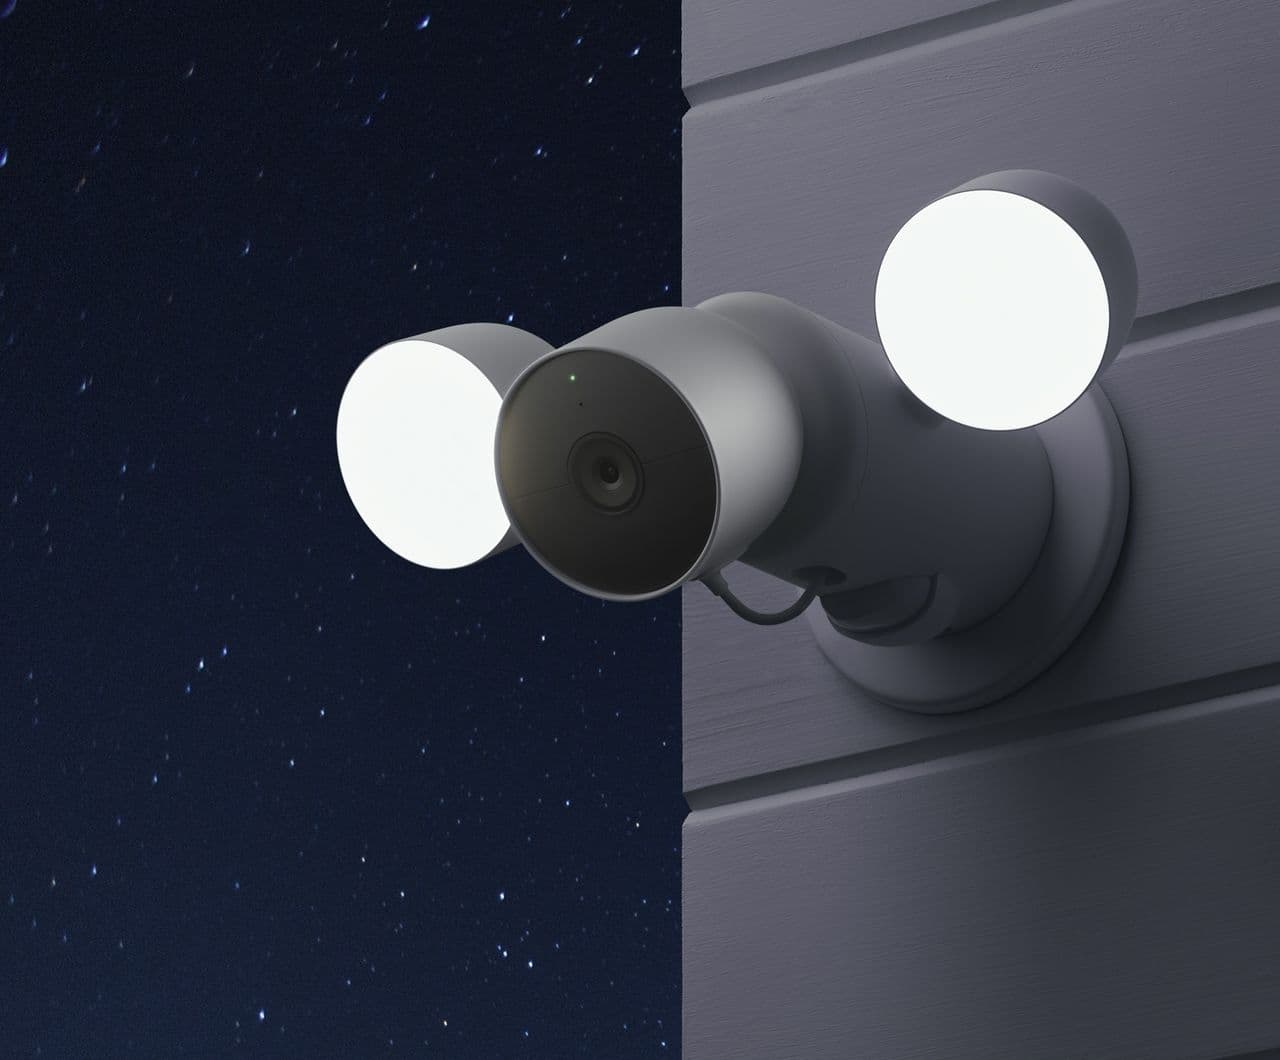 Google has finally introduced several new Nest cameras